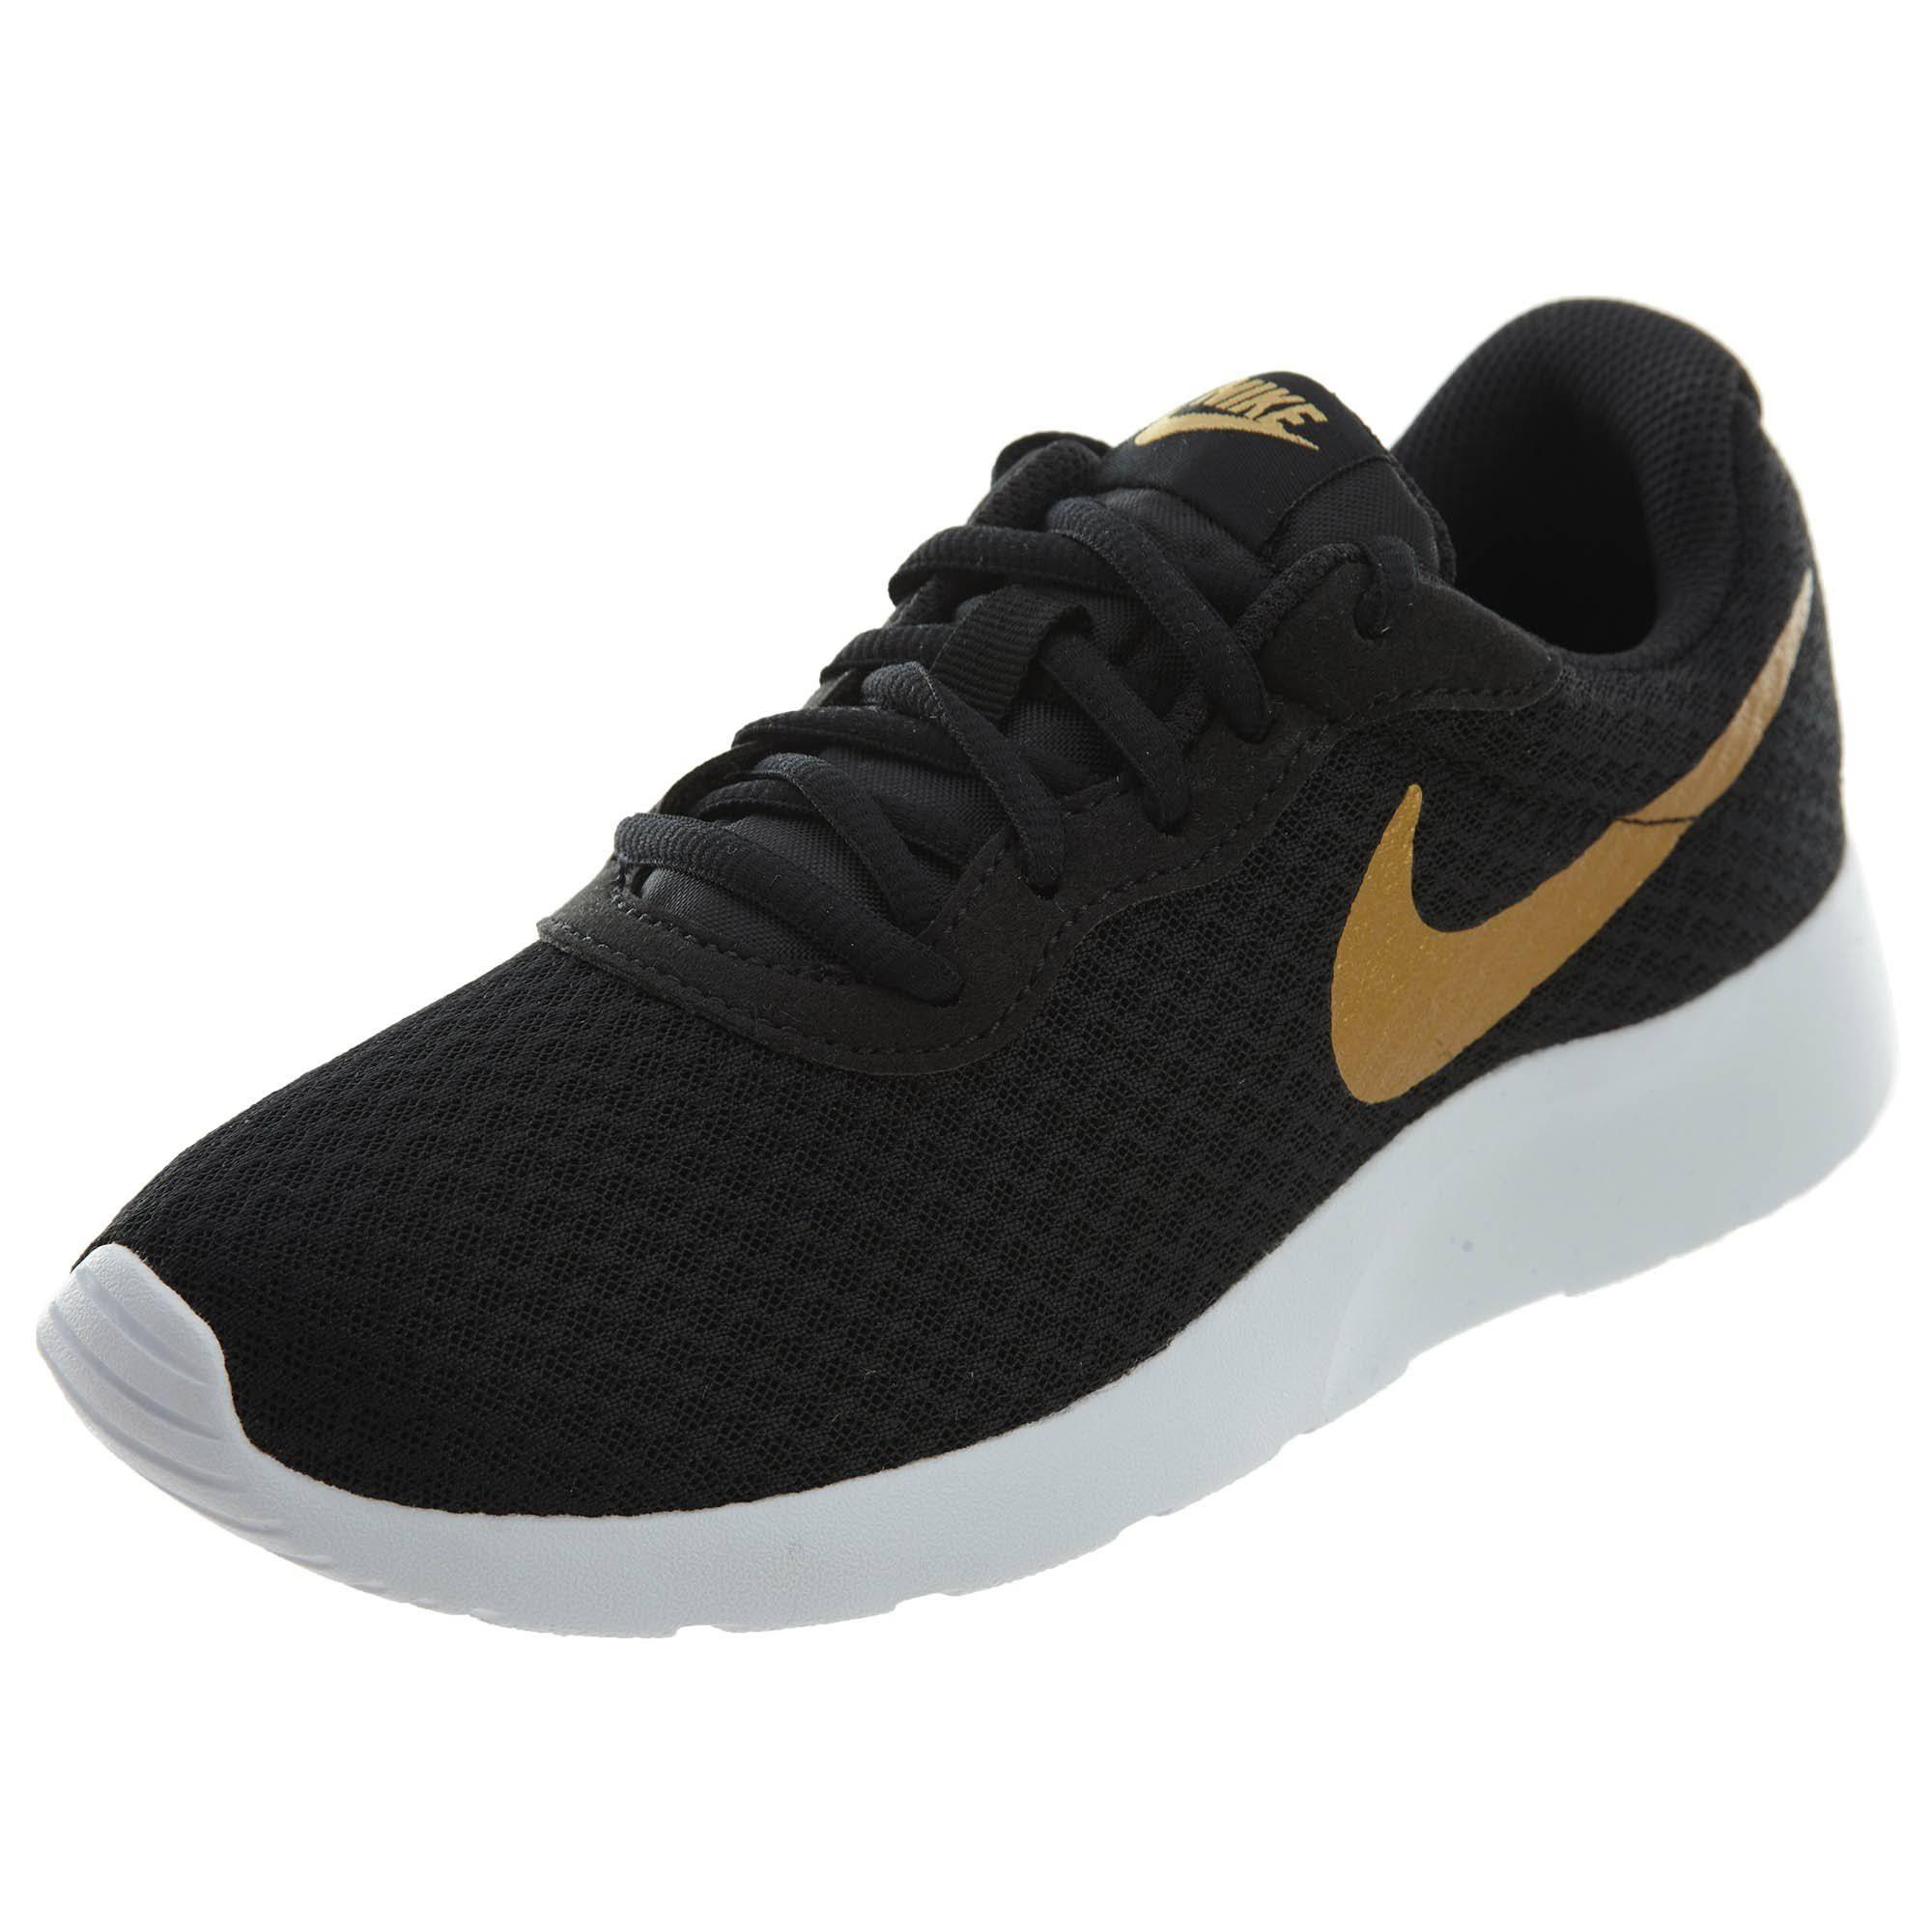 Tanjun Negro Nike Metalizado 004 Dorado 812655 8wwqCg